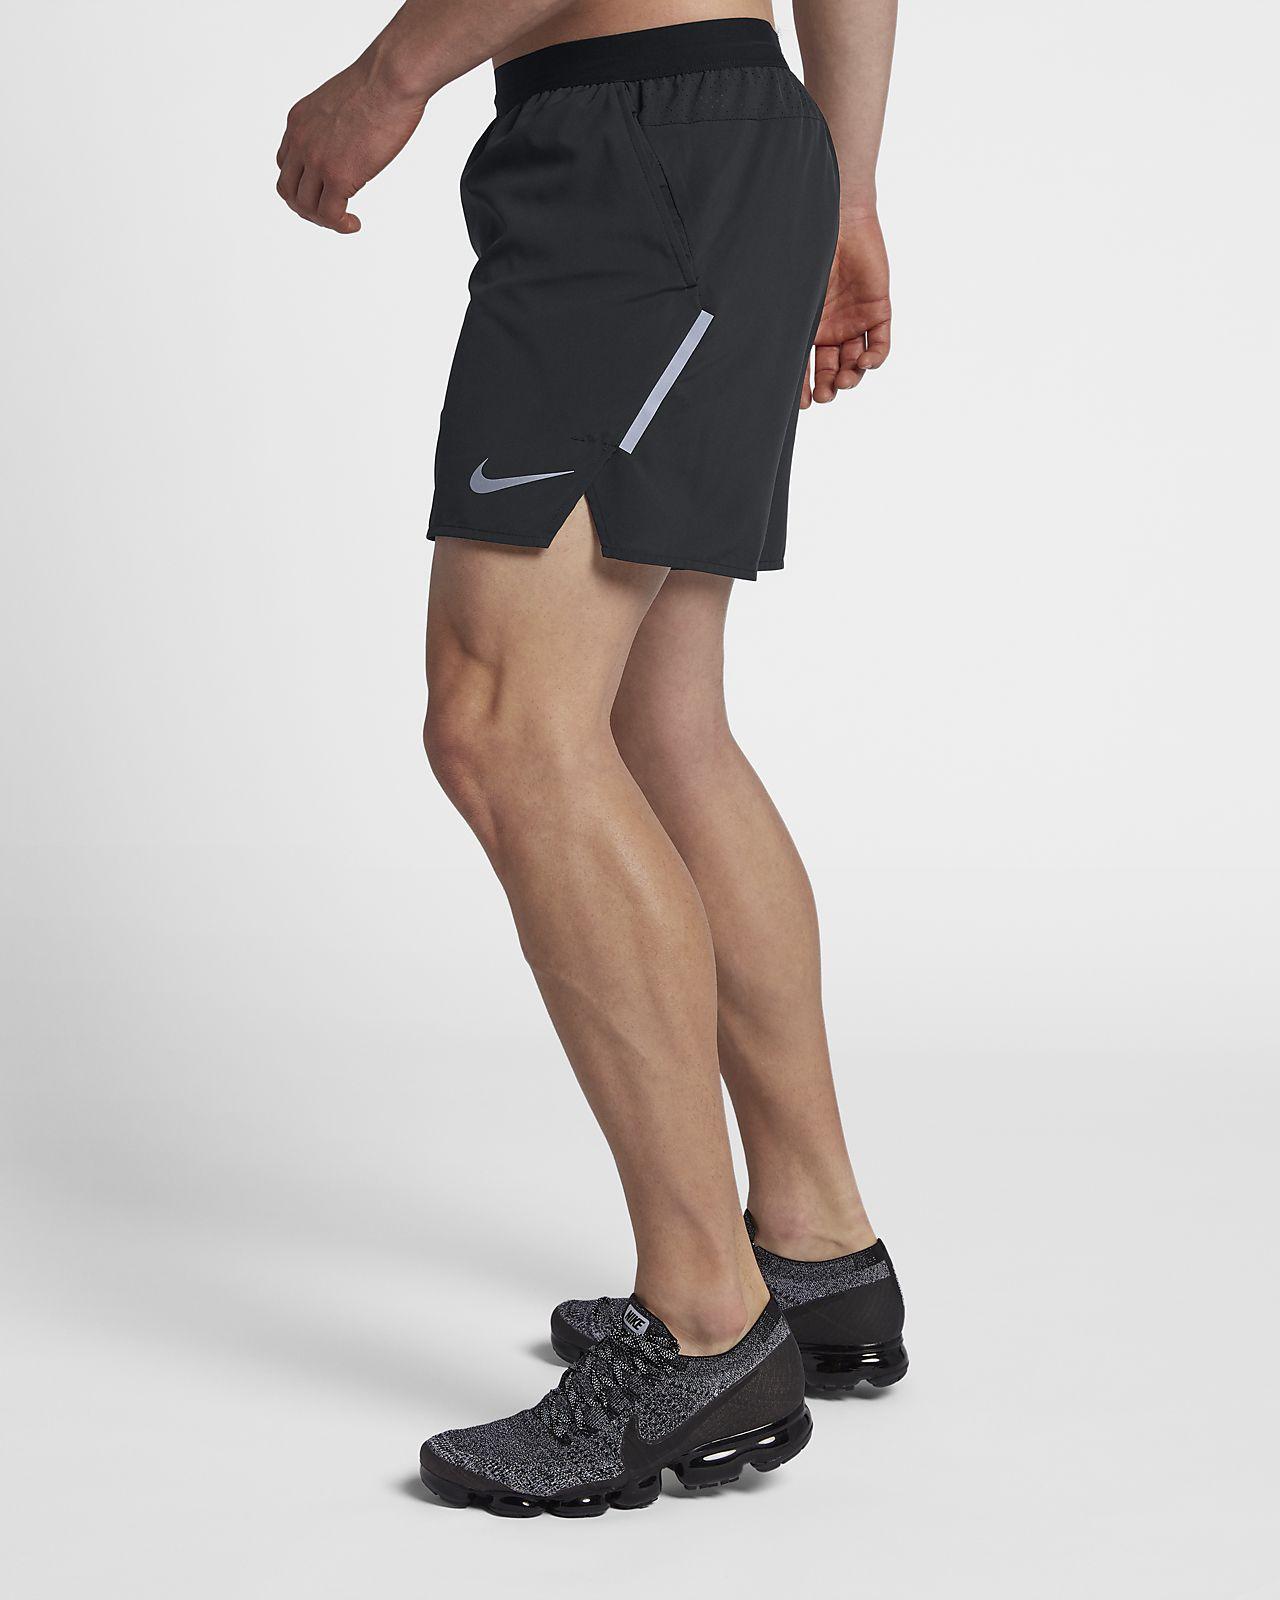 nike 9 tennis shortsnike shorts uomo